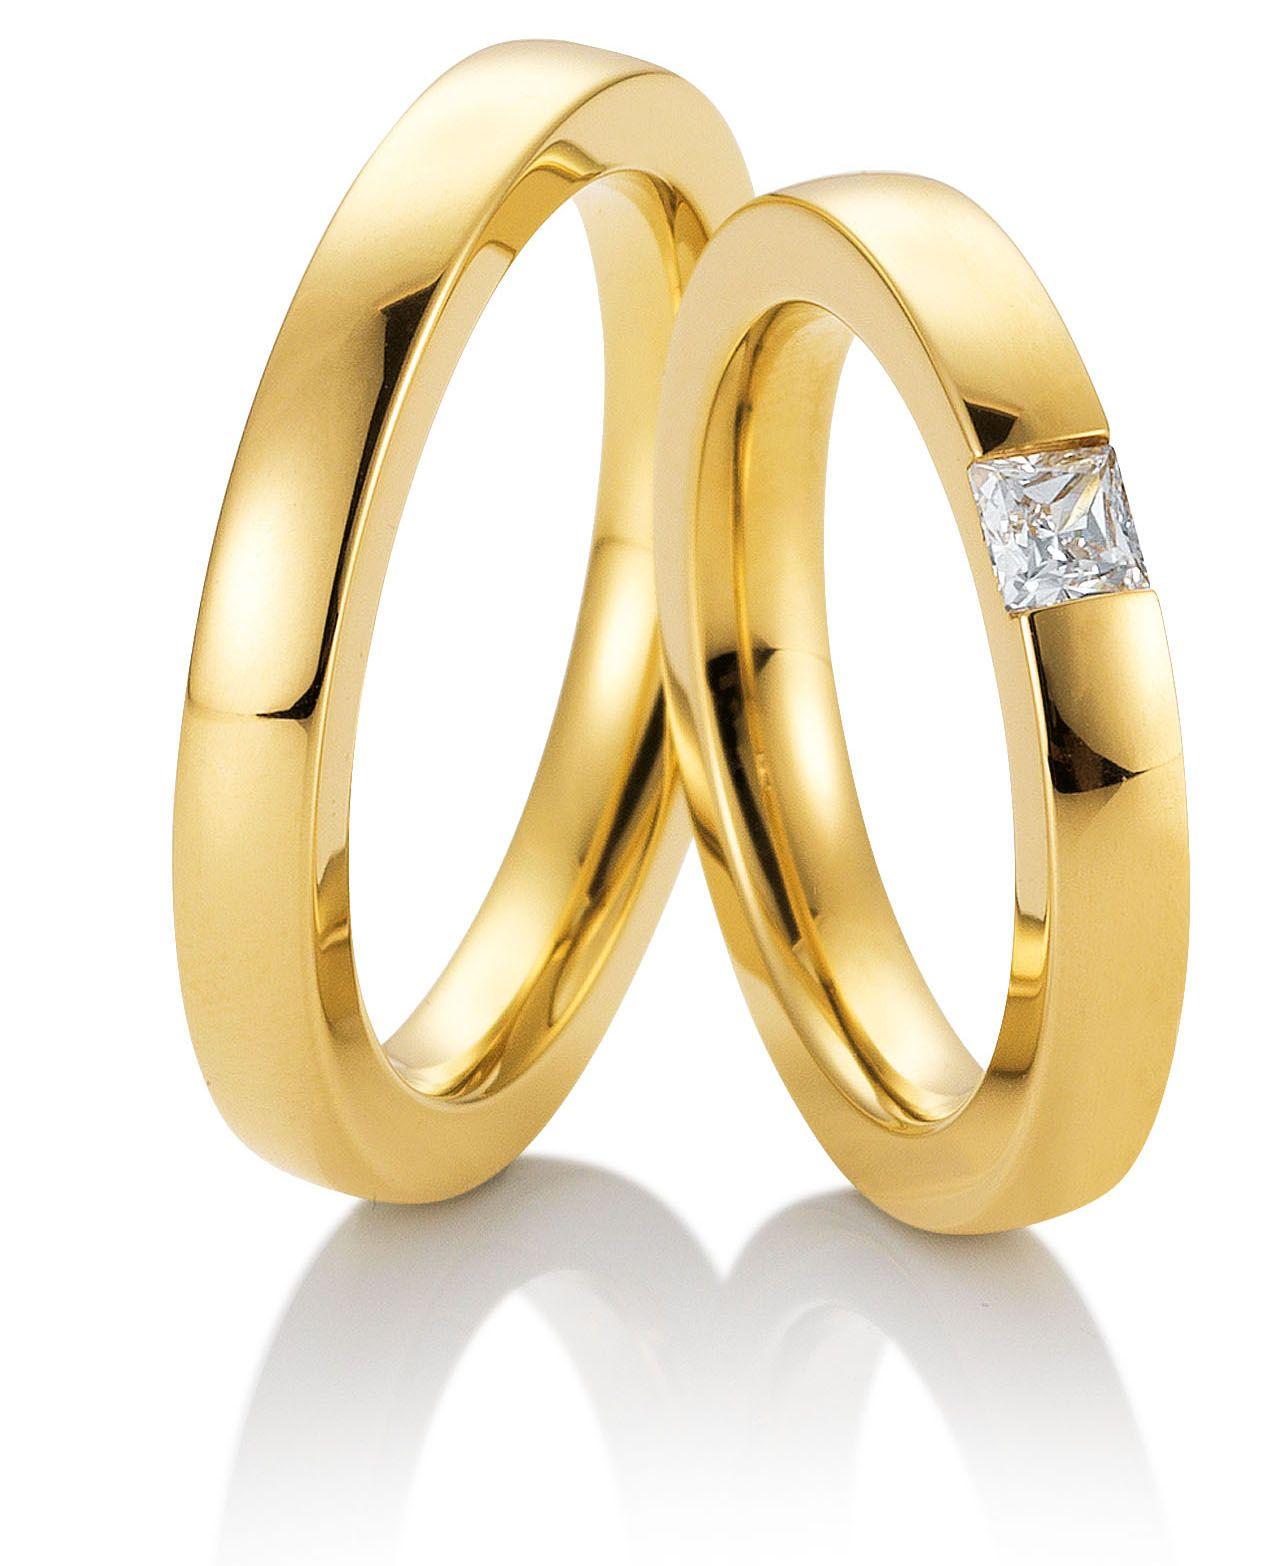 Eheringe Trauringe 49 81561 Gelbgold 585 Gold Jewelry Jewels